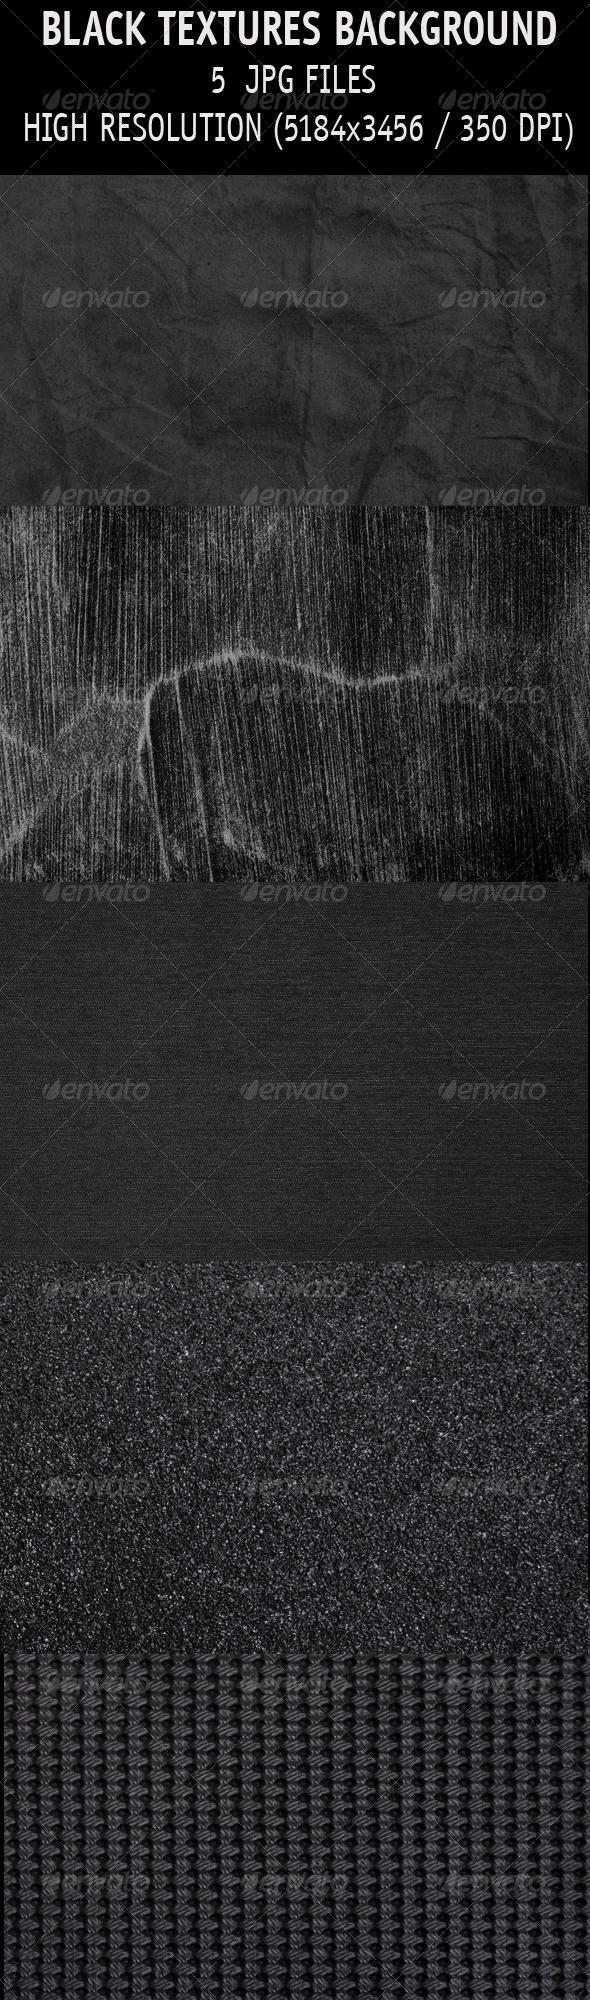 Black textures background - Industrial / Grunge Textures